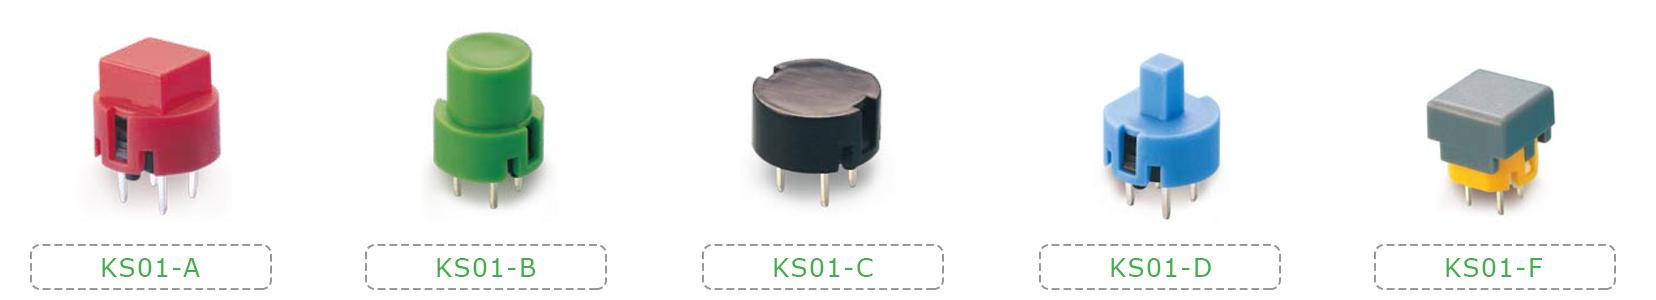 non illuminated pcb push button switches, coloured caps, custom, RJS Electronics Ltd